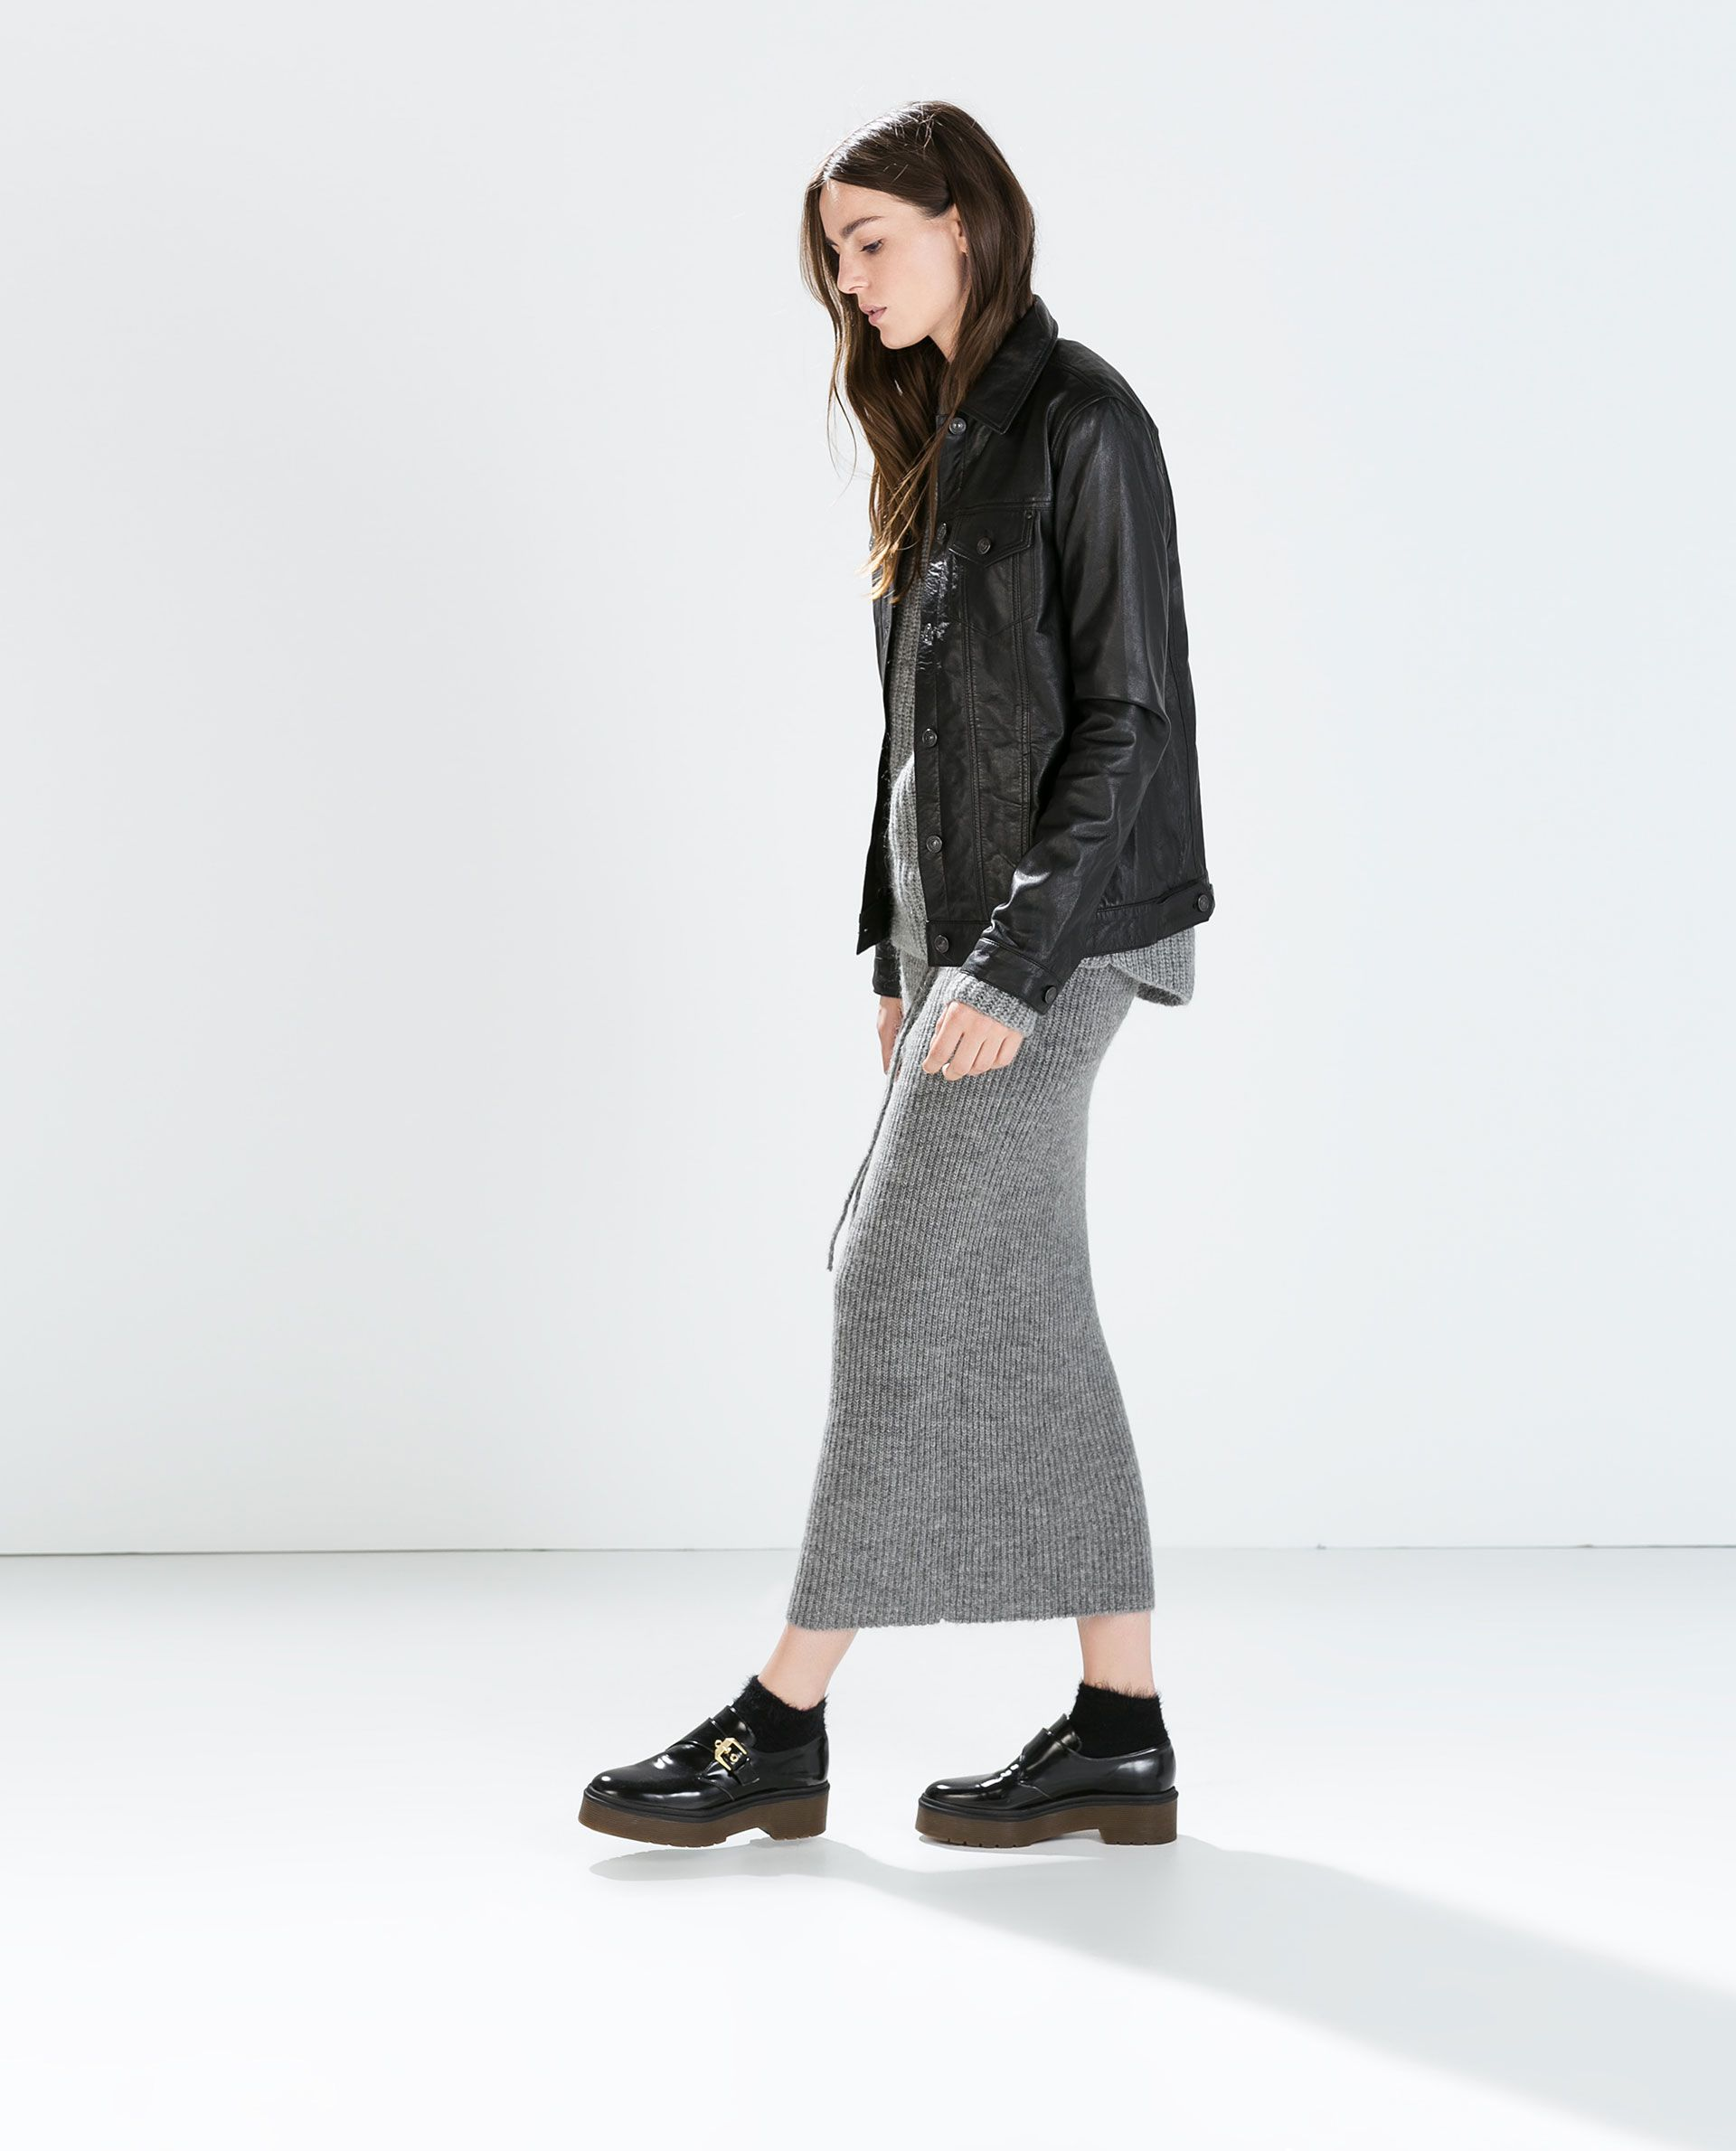 Zara Leather Jacket Leather jacket, Jackets, Zara